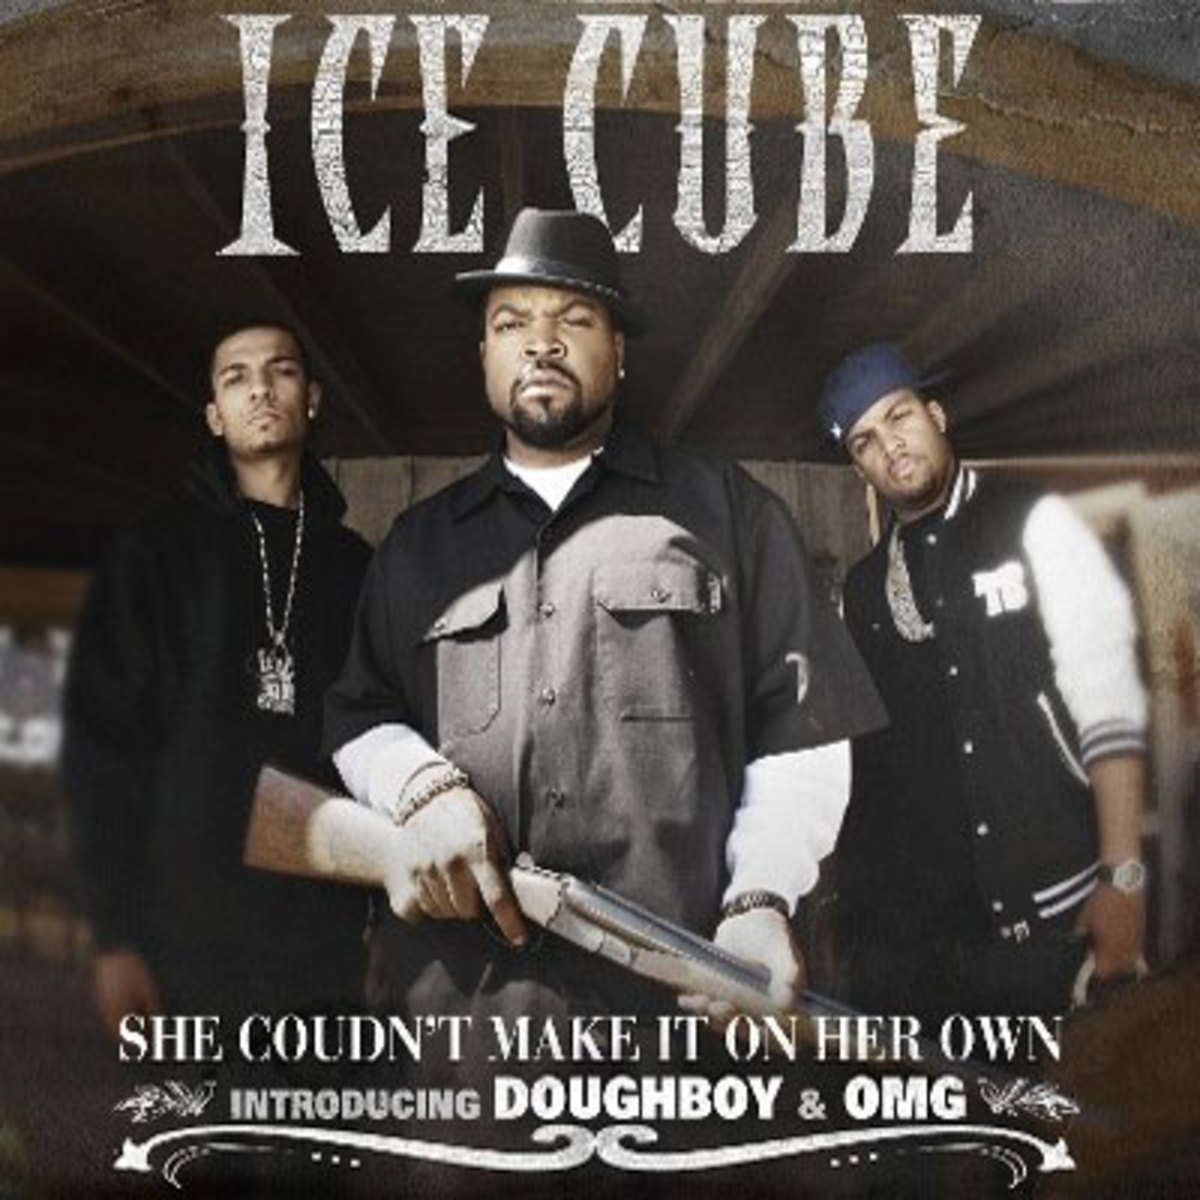 icecube-shecodntmakeitonherown.jpg